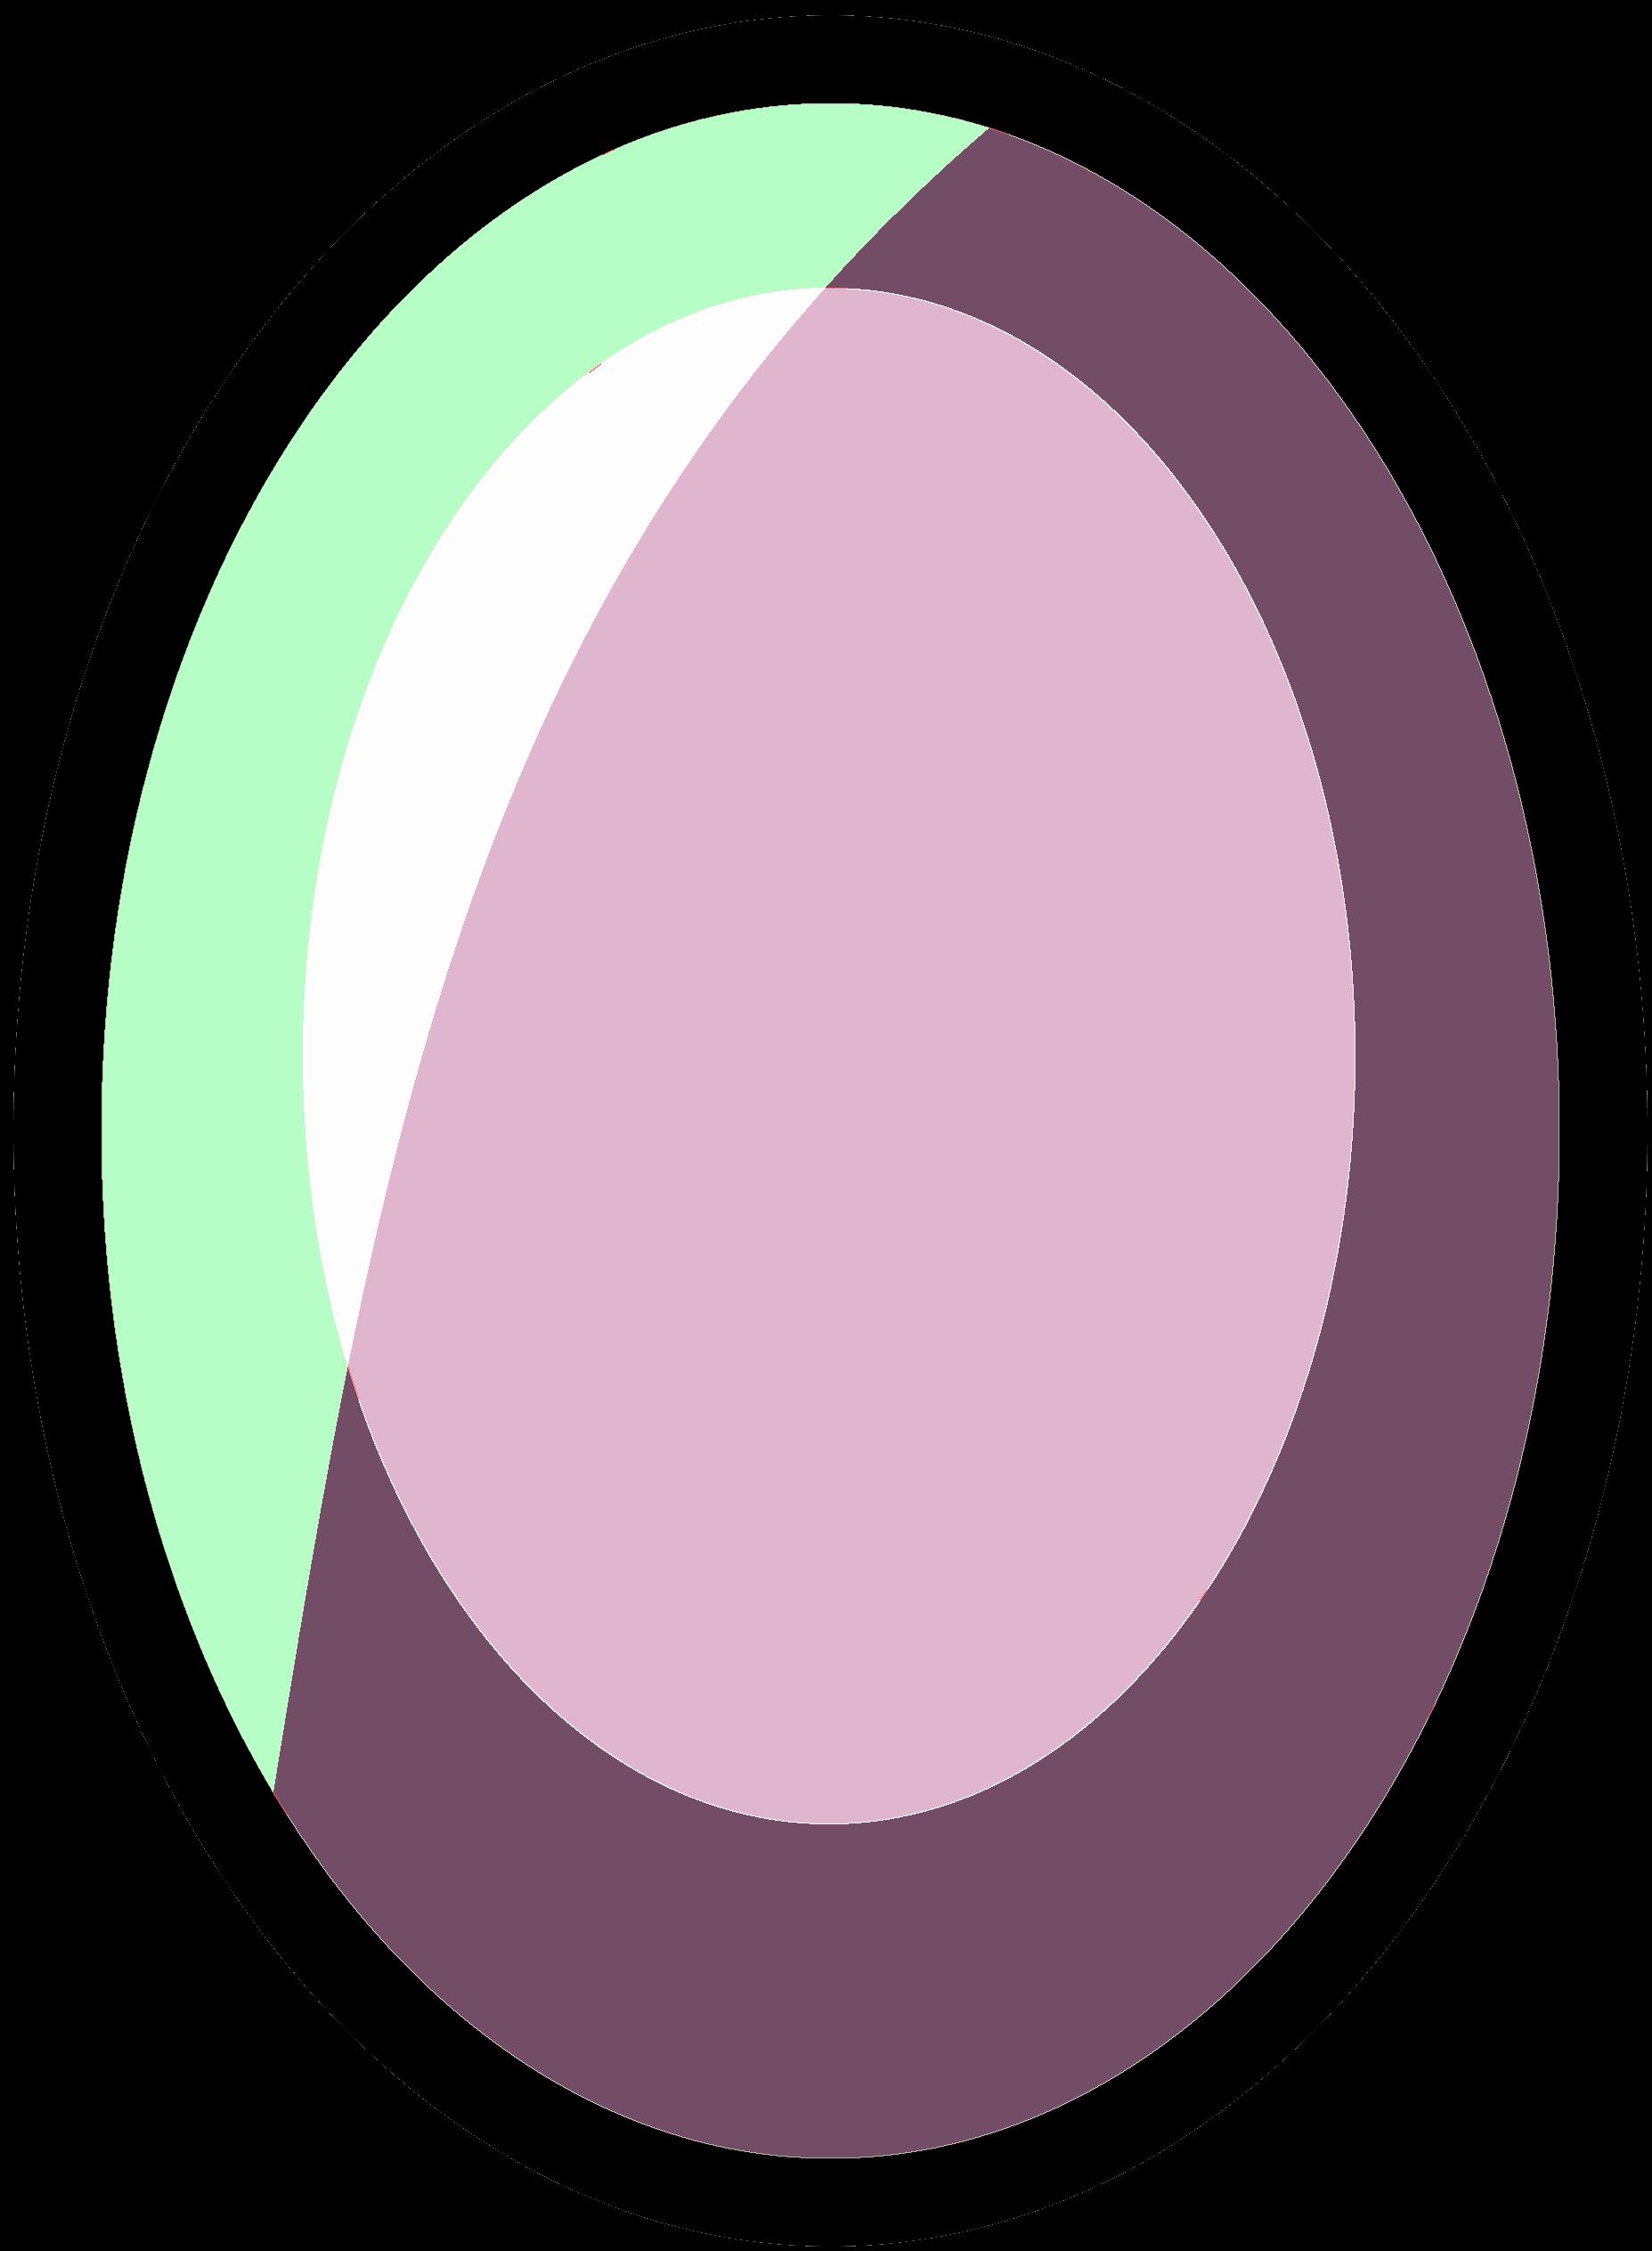 onyx symbol